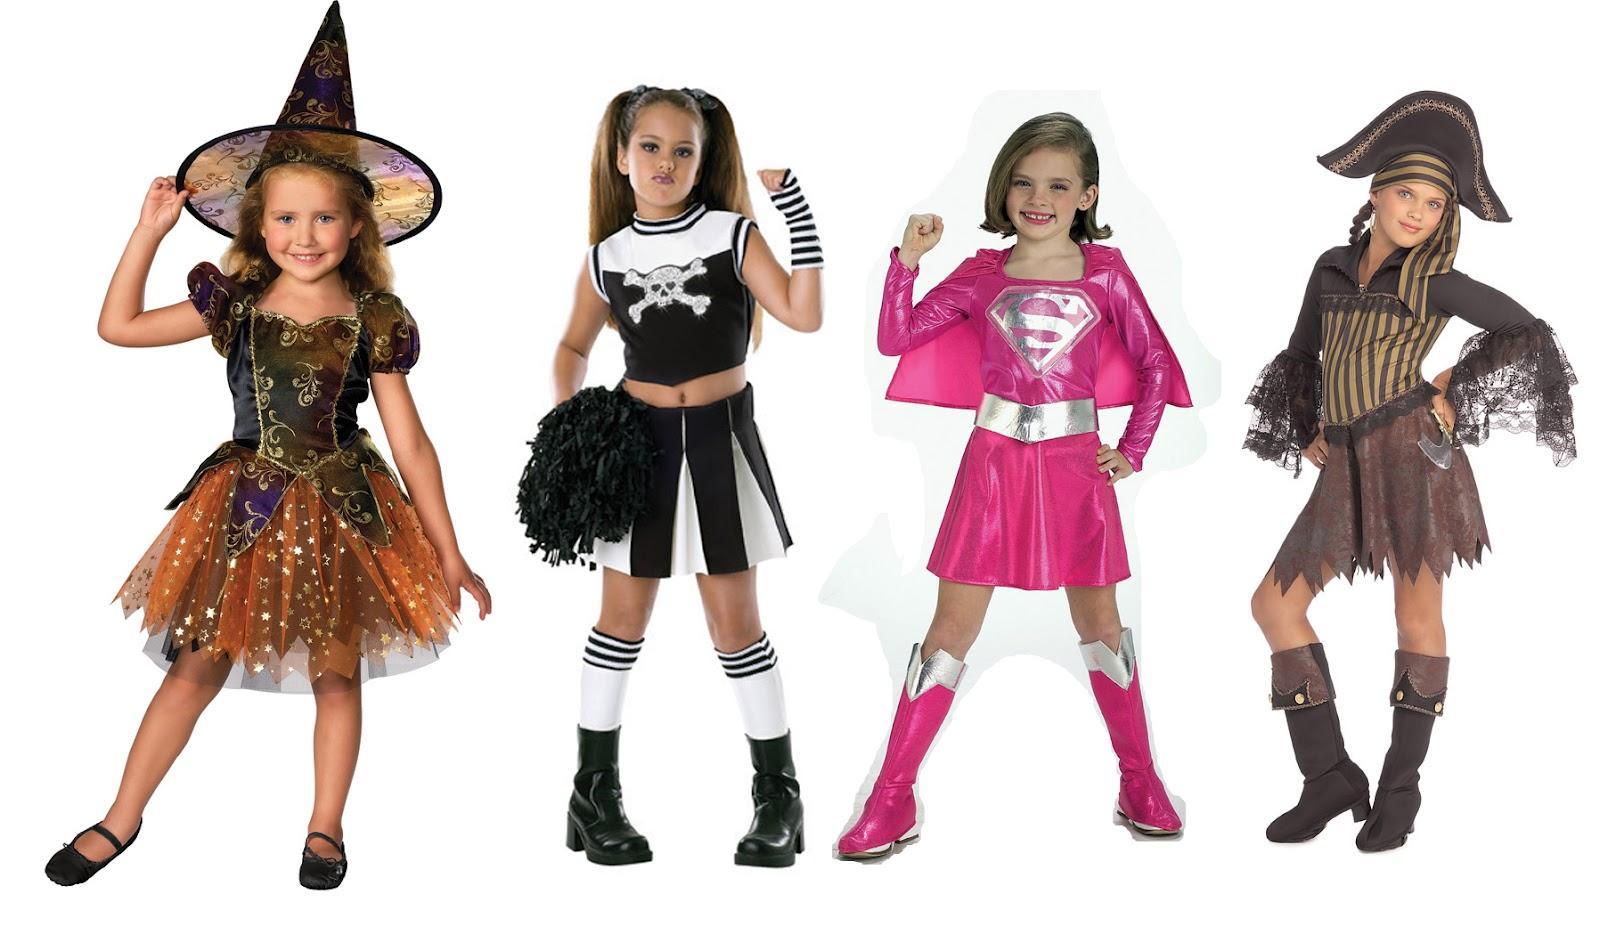 Halloween Gallery Photo: Halloween Costumes For Kids